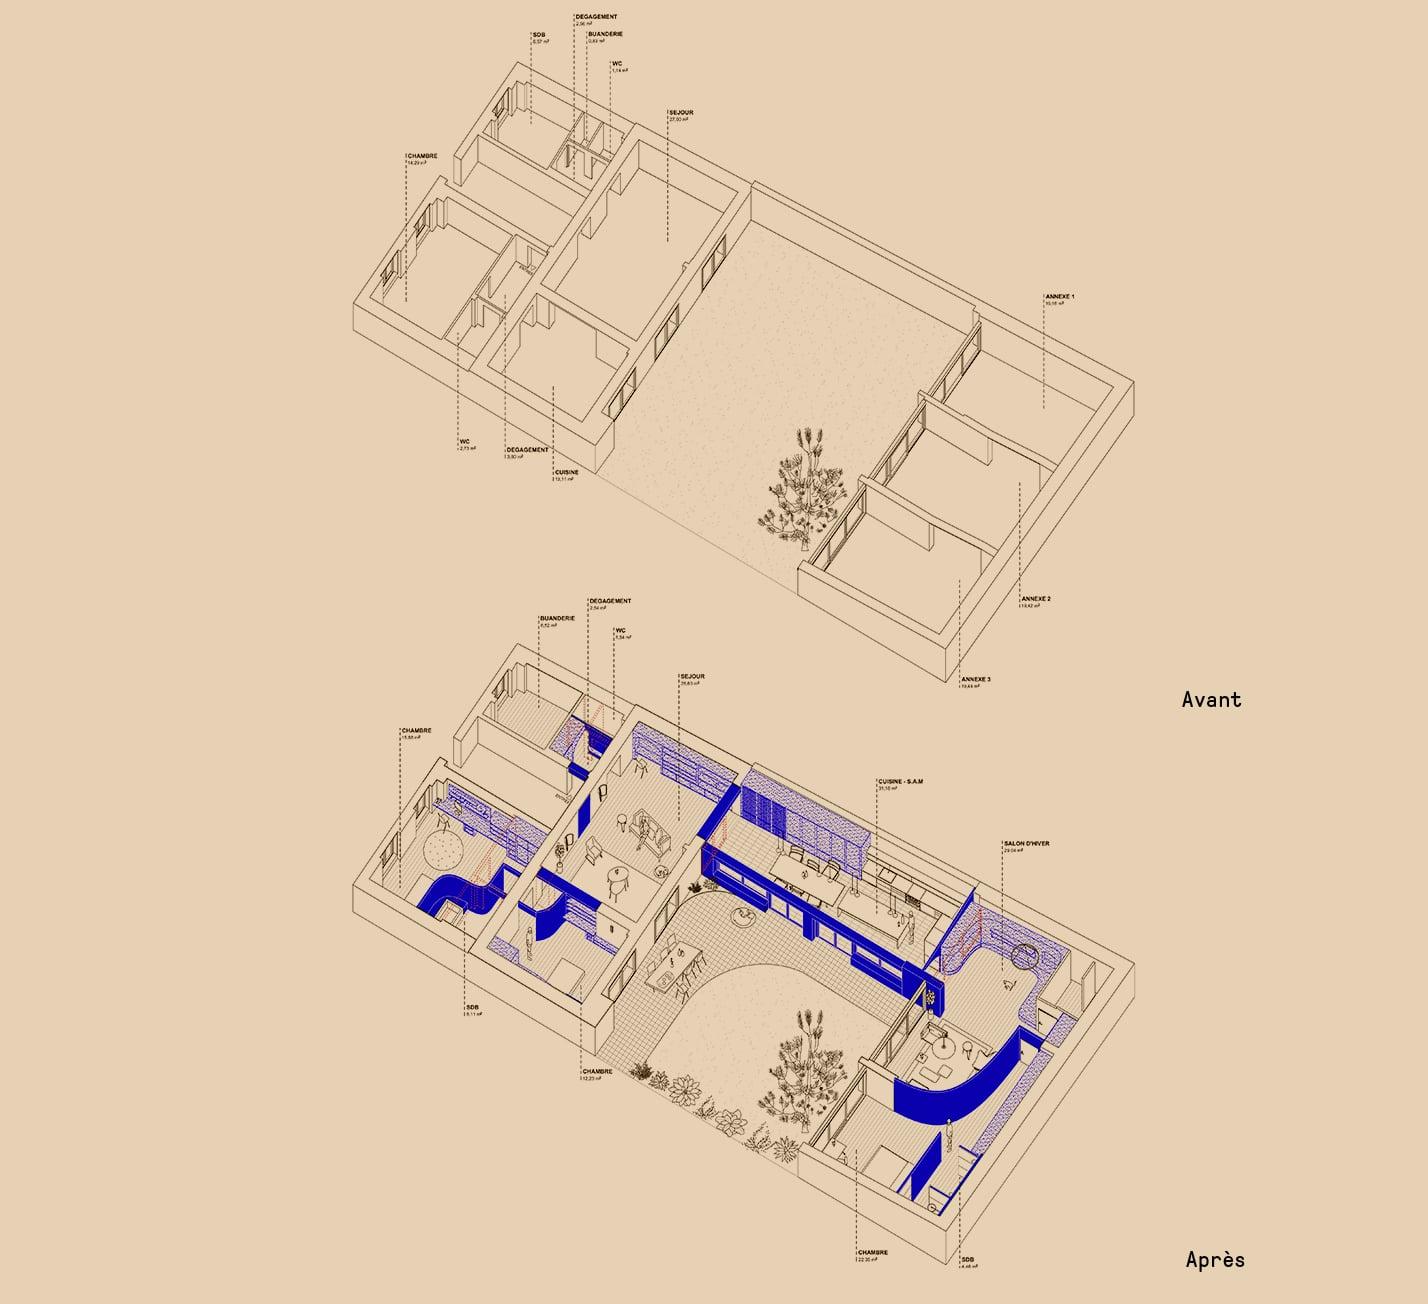 Appartement-Louise-Psd-dessins-1-min